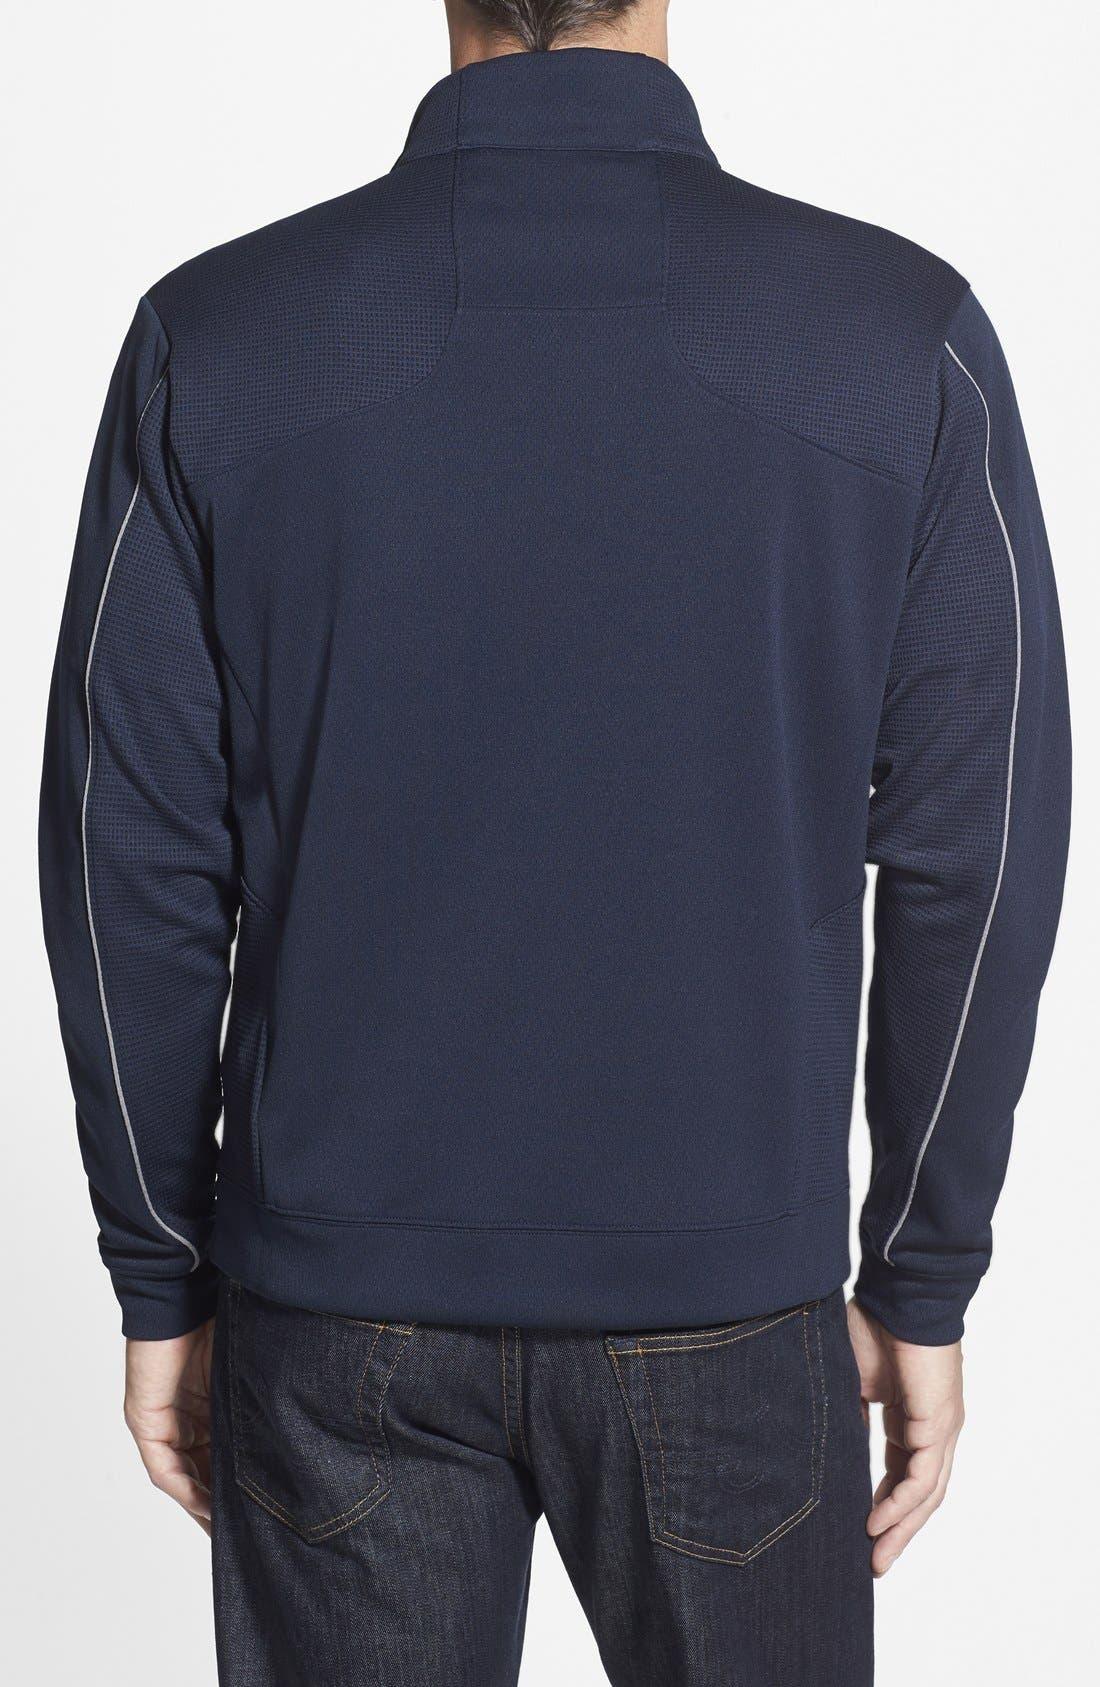 New England Patriots - Edge DryTec Moisture Wicking Half Zip Pullover,                             Alternate thumbnail 2, color,                             420